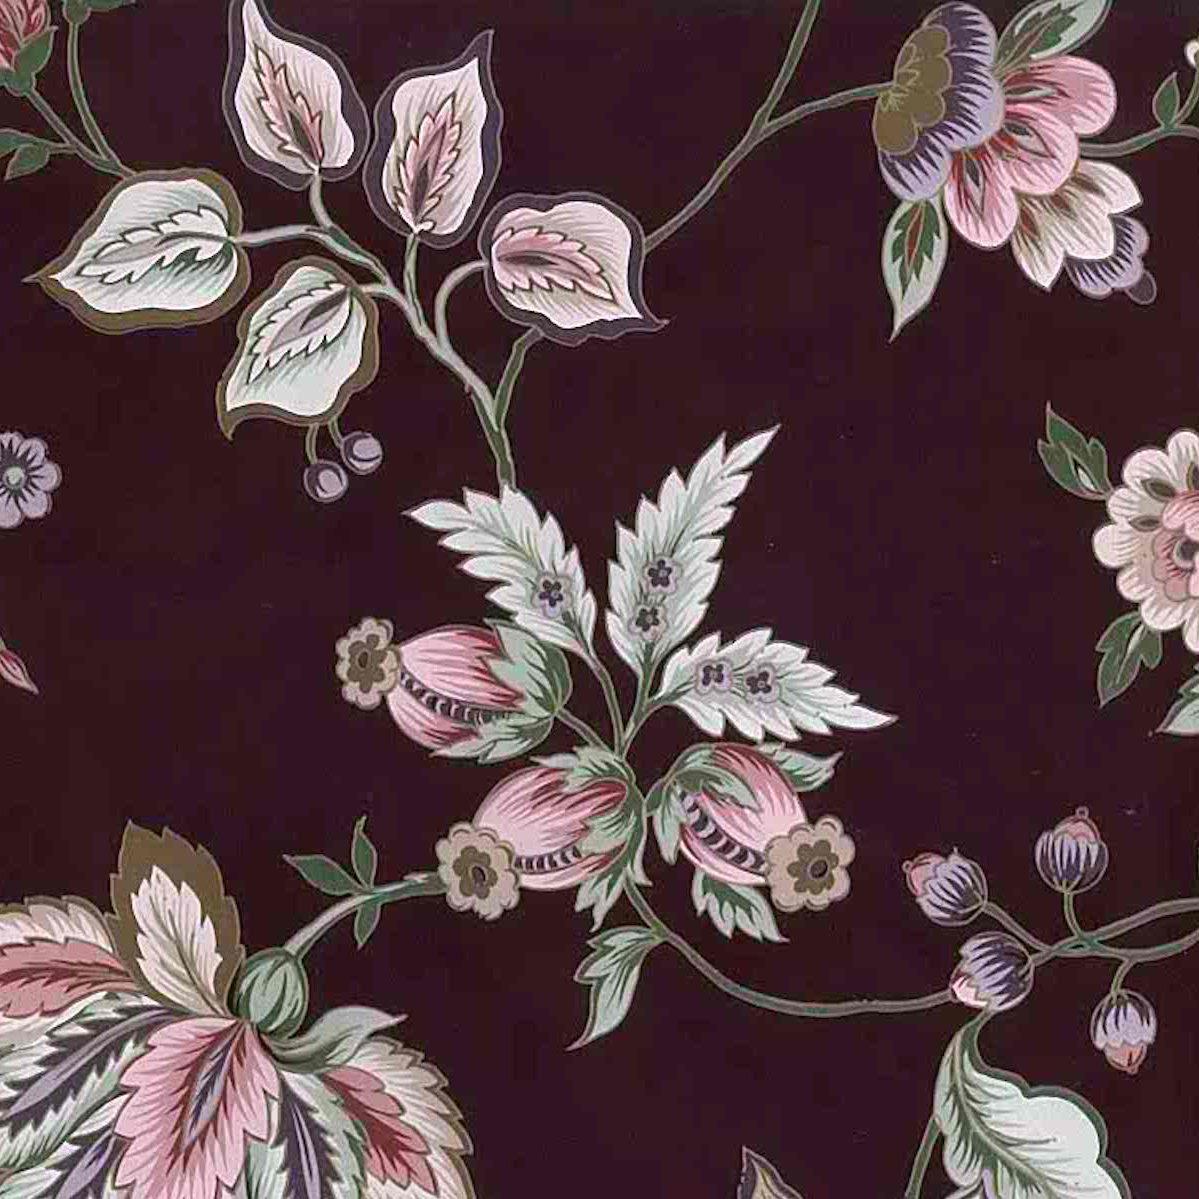 maroon floral vintage wallpaper, stylized flowers